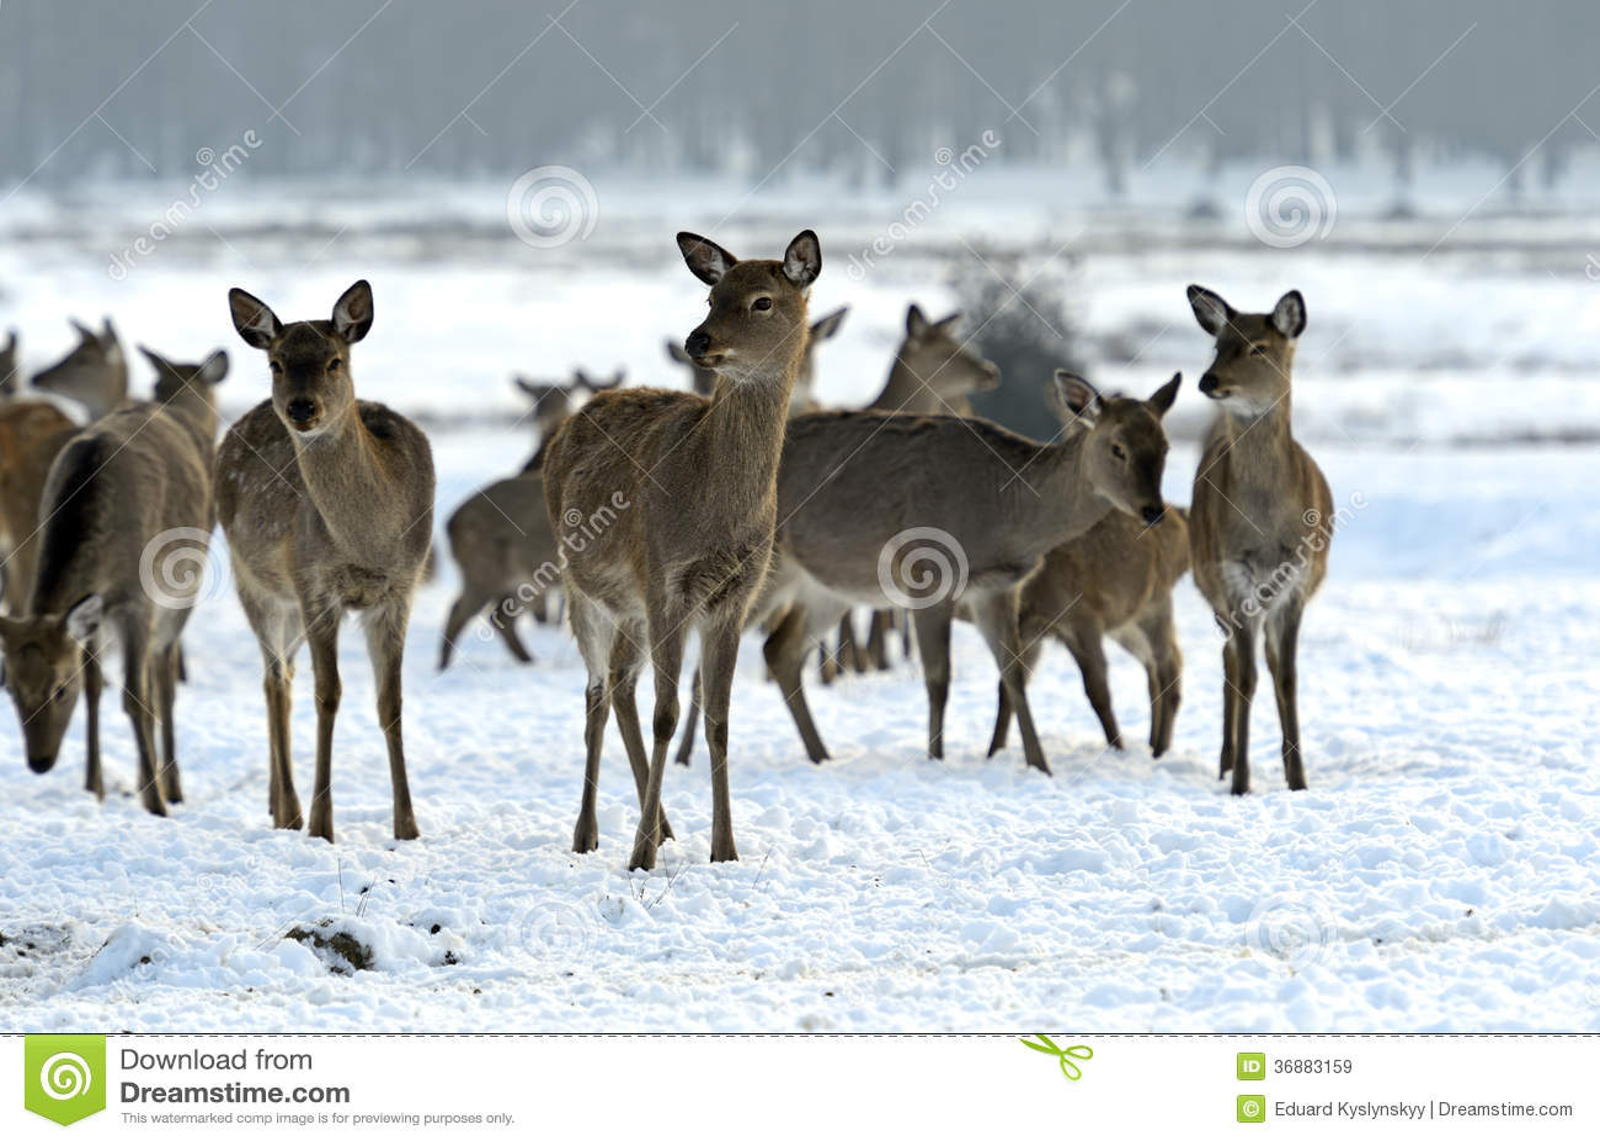 Download Cervi macchiati immagine stock. Immagine di neve, wildlife - 36883159